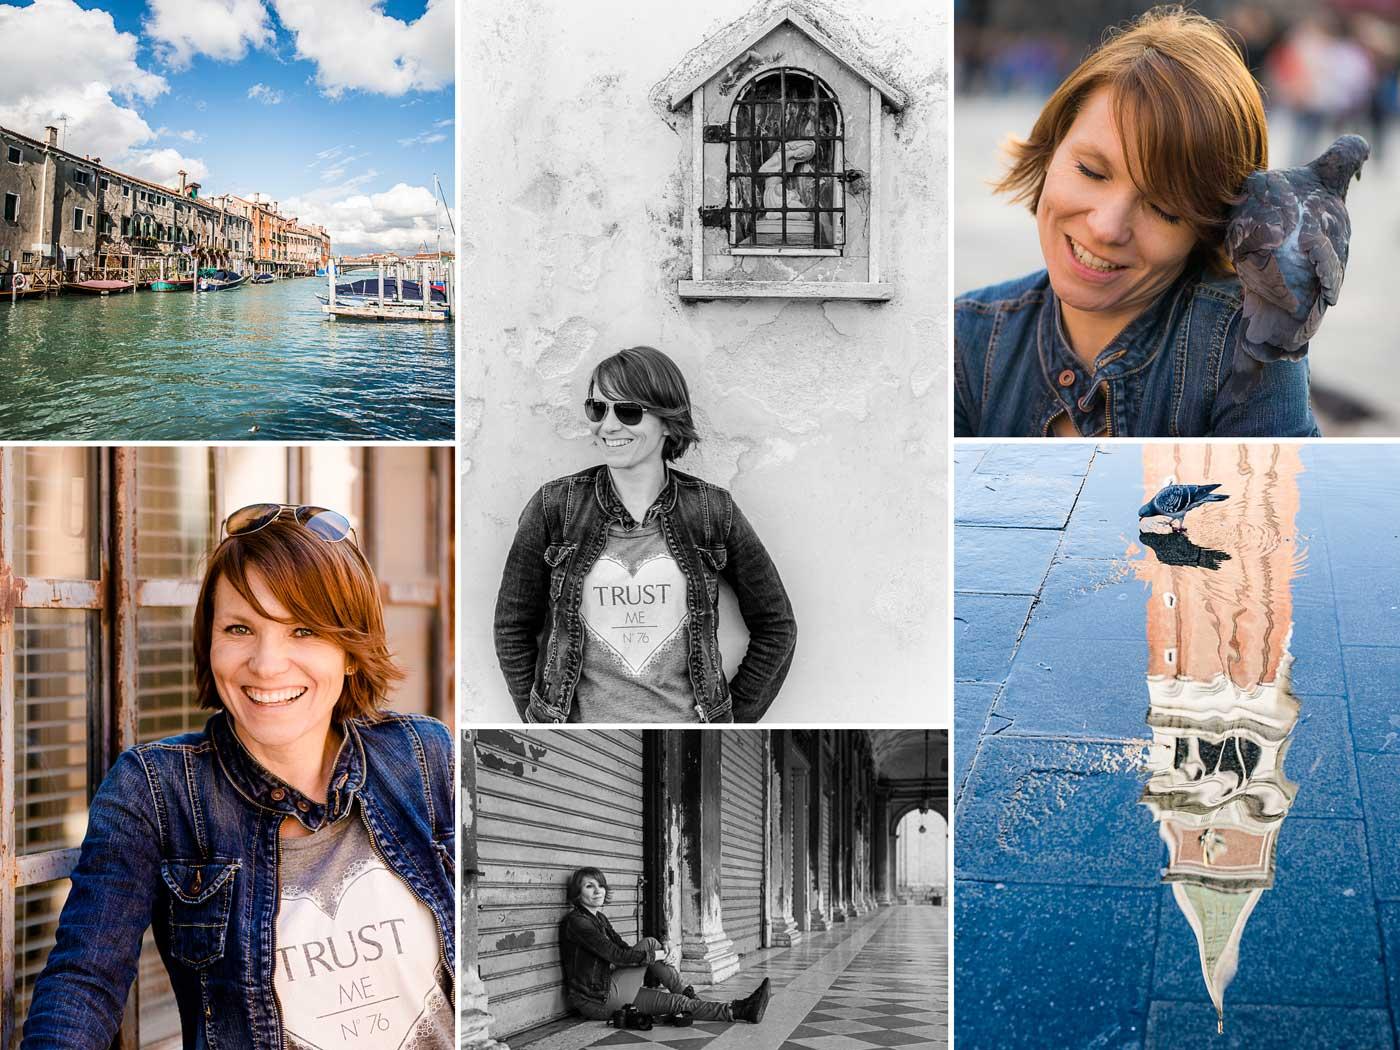 Portraitshooting | Fotografin in Venedig